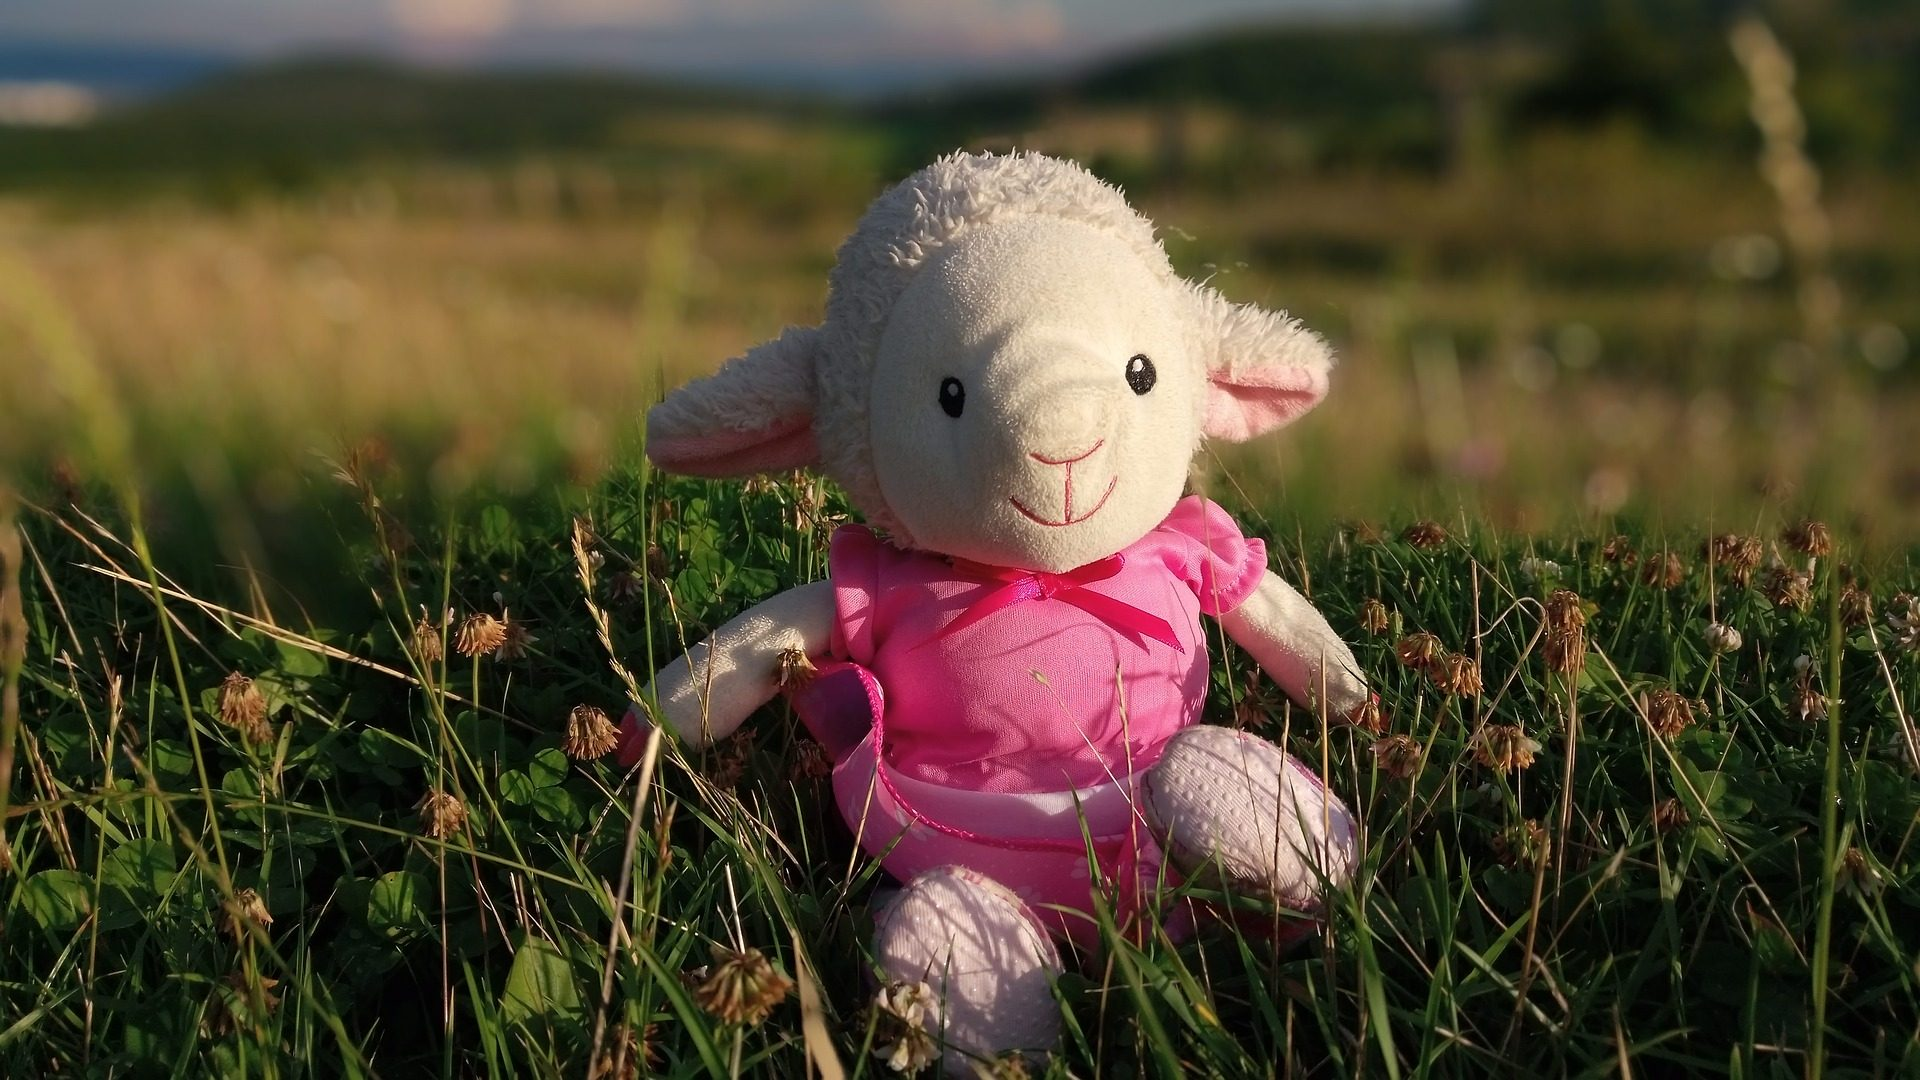 campo, prado, oveja, peluche, muñeco, hierba - Fondos de Pantalla HD - professor-falken.com